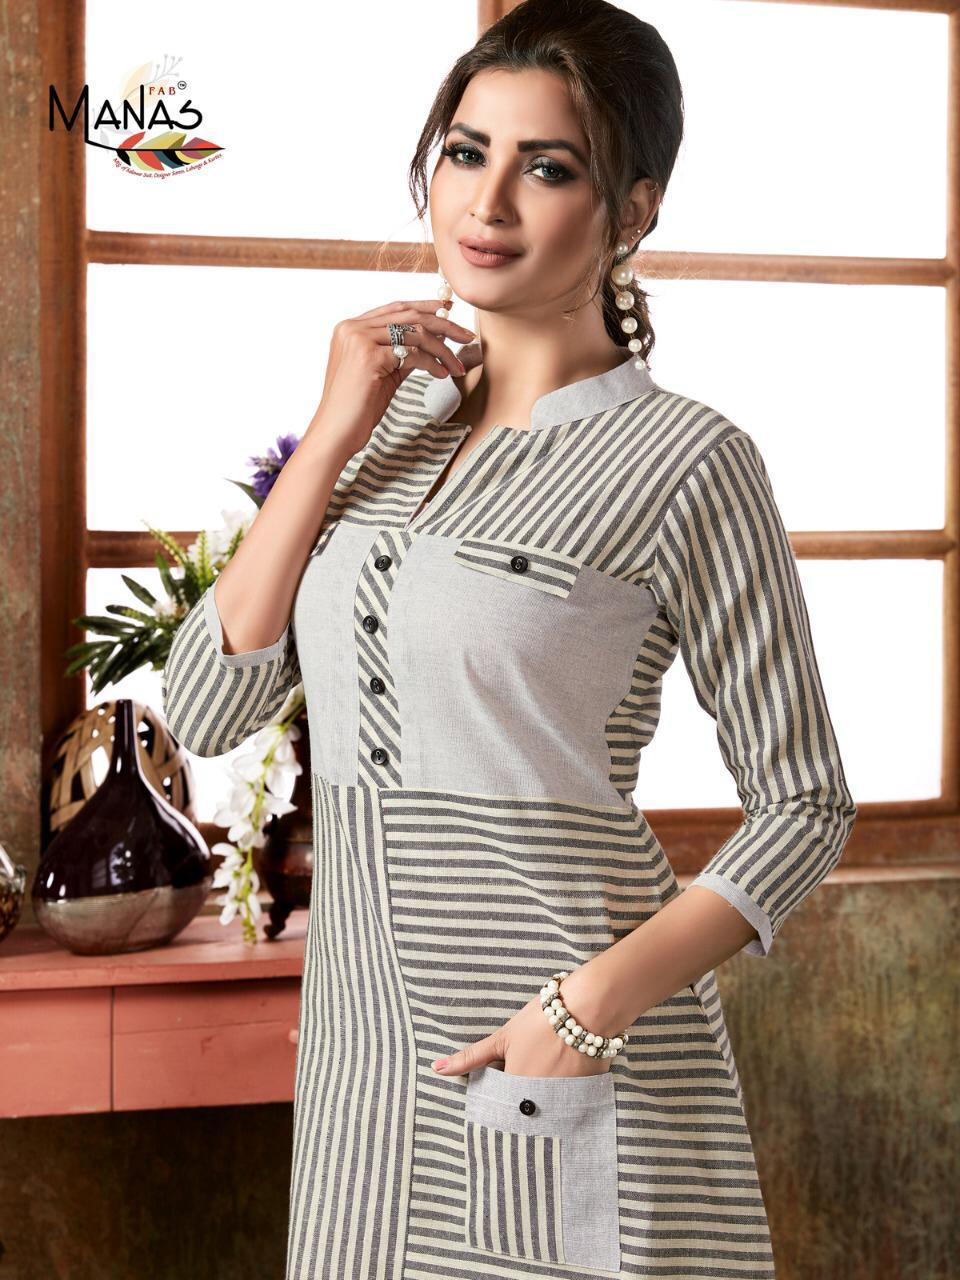 Manas Aaheli Designer Hamdloom Cotton Gown Pettern Kurtis Best Wholesale Rate